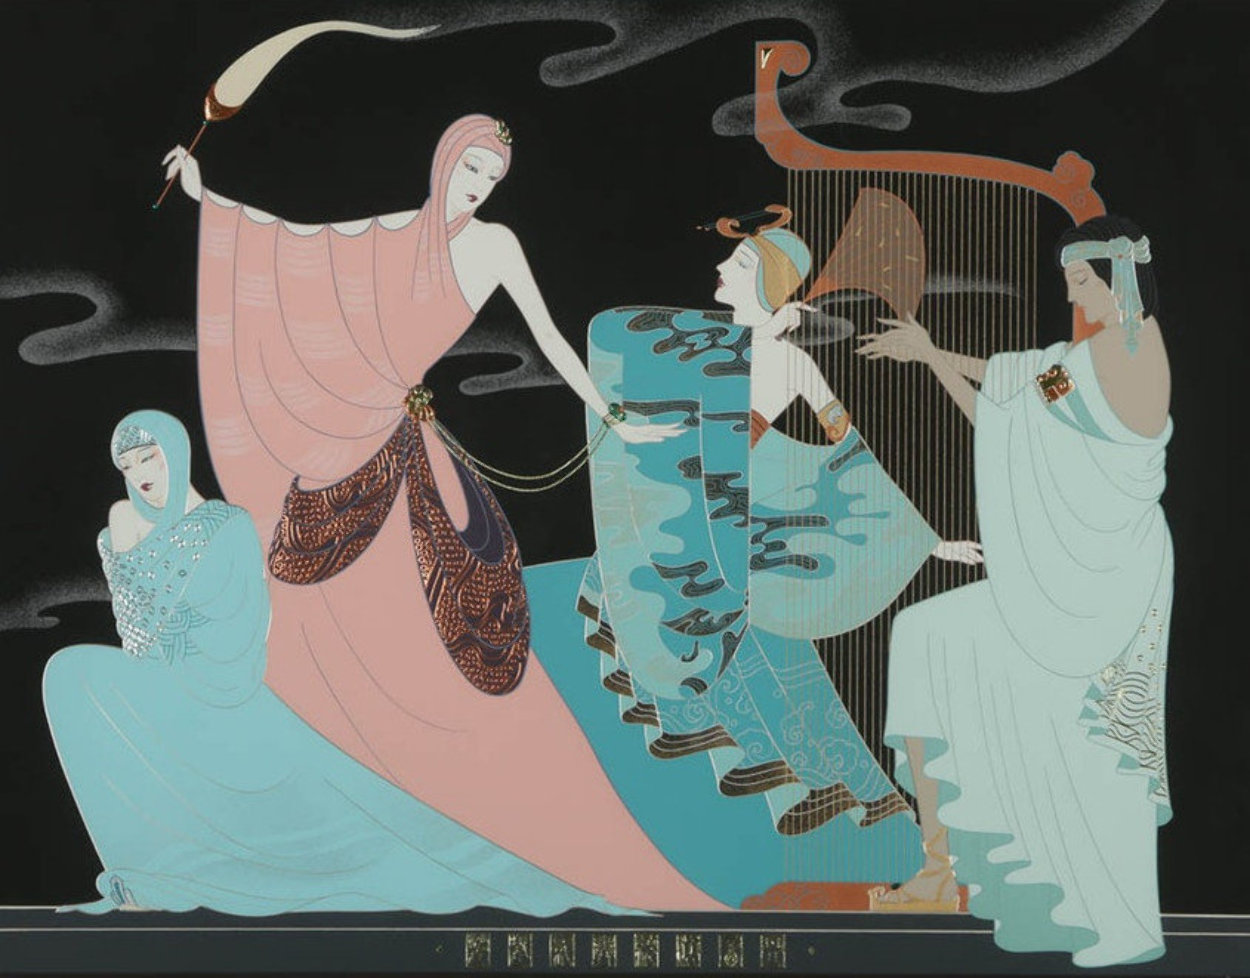 Harmony 1991  Limited Edition Print by Lillian Shao